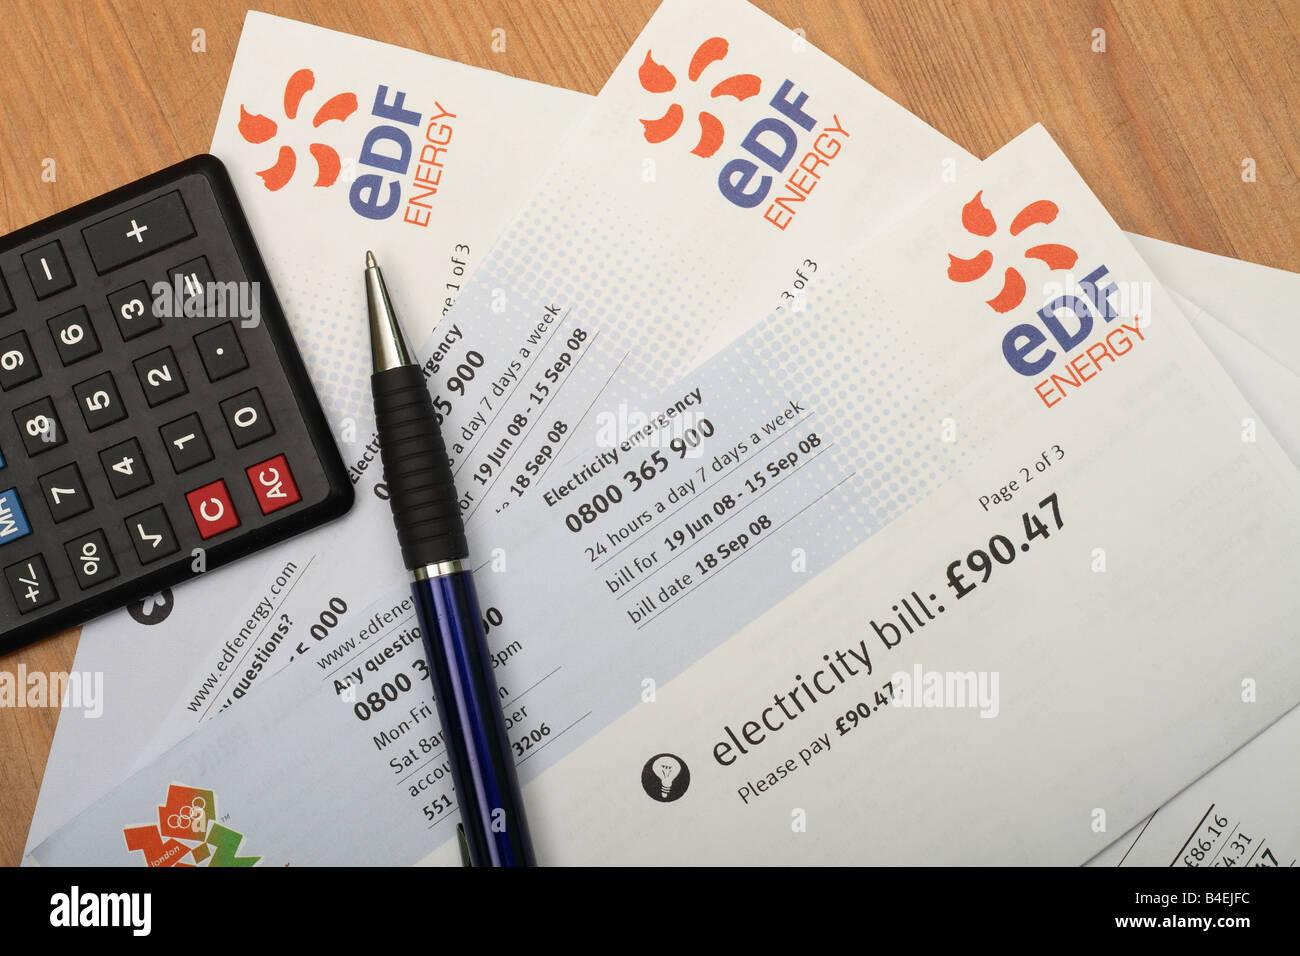 EDF Electricity Domestic Home Fuel Power Bill Cost